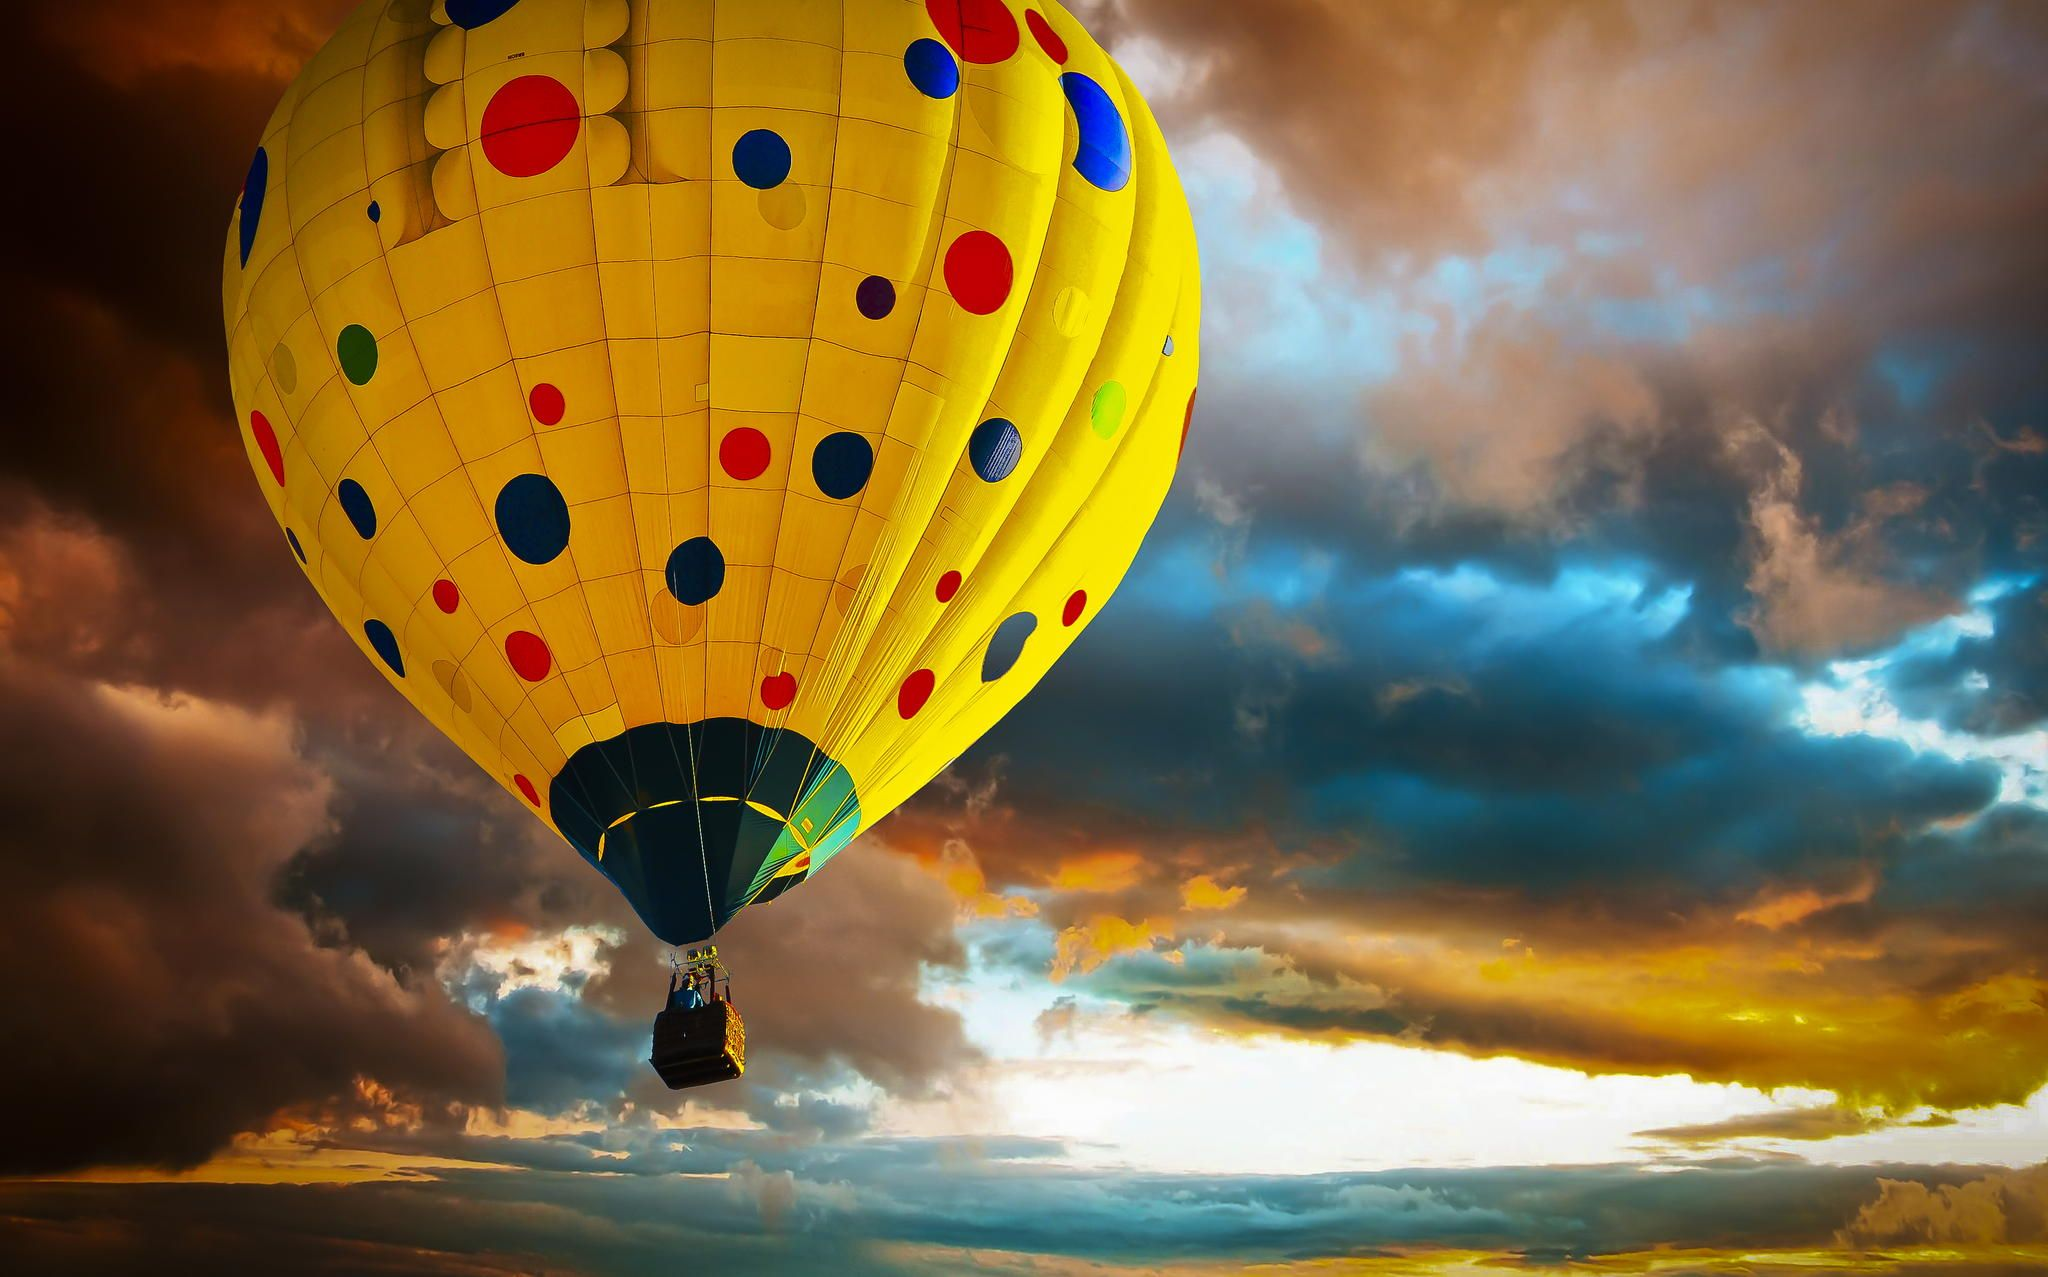 Dream Flight Balloons, Hot air balloon rides, Hot air ballon